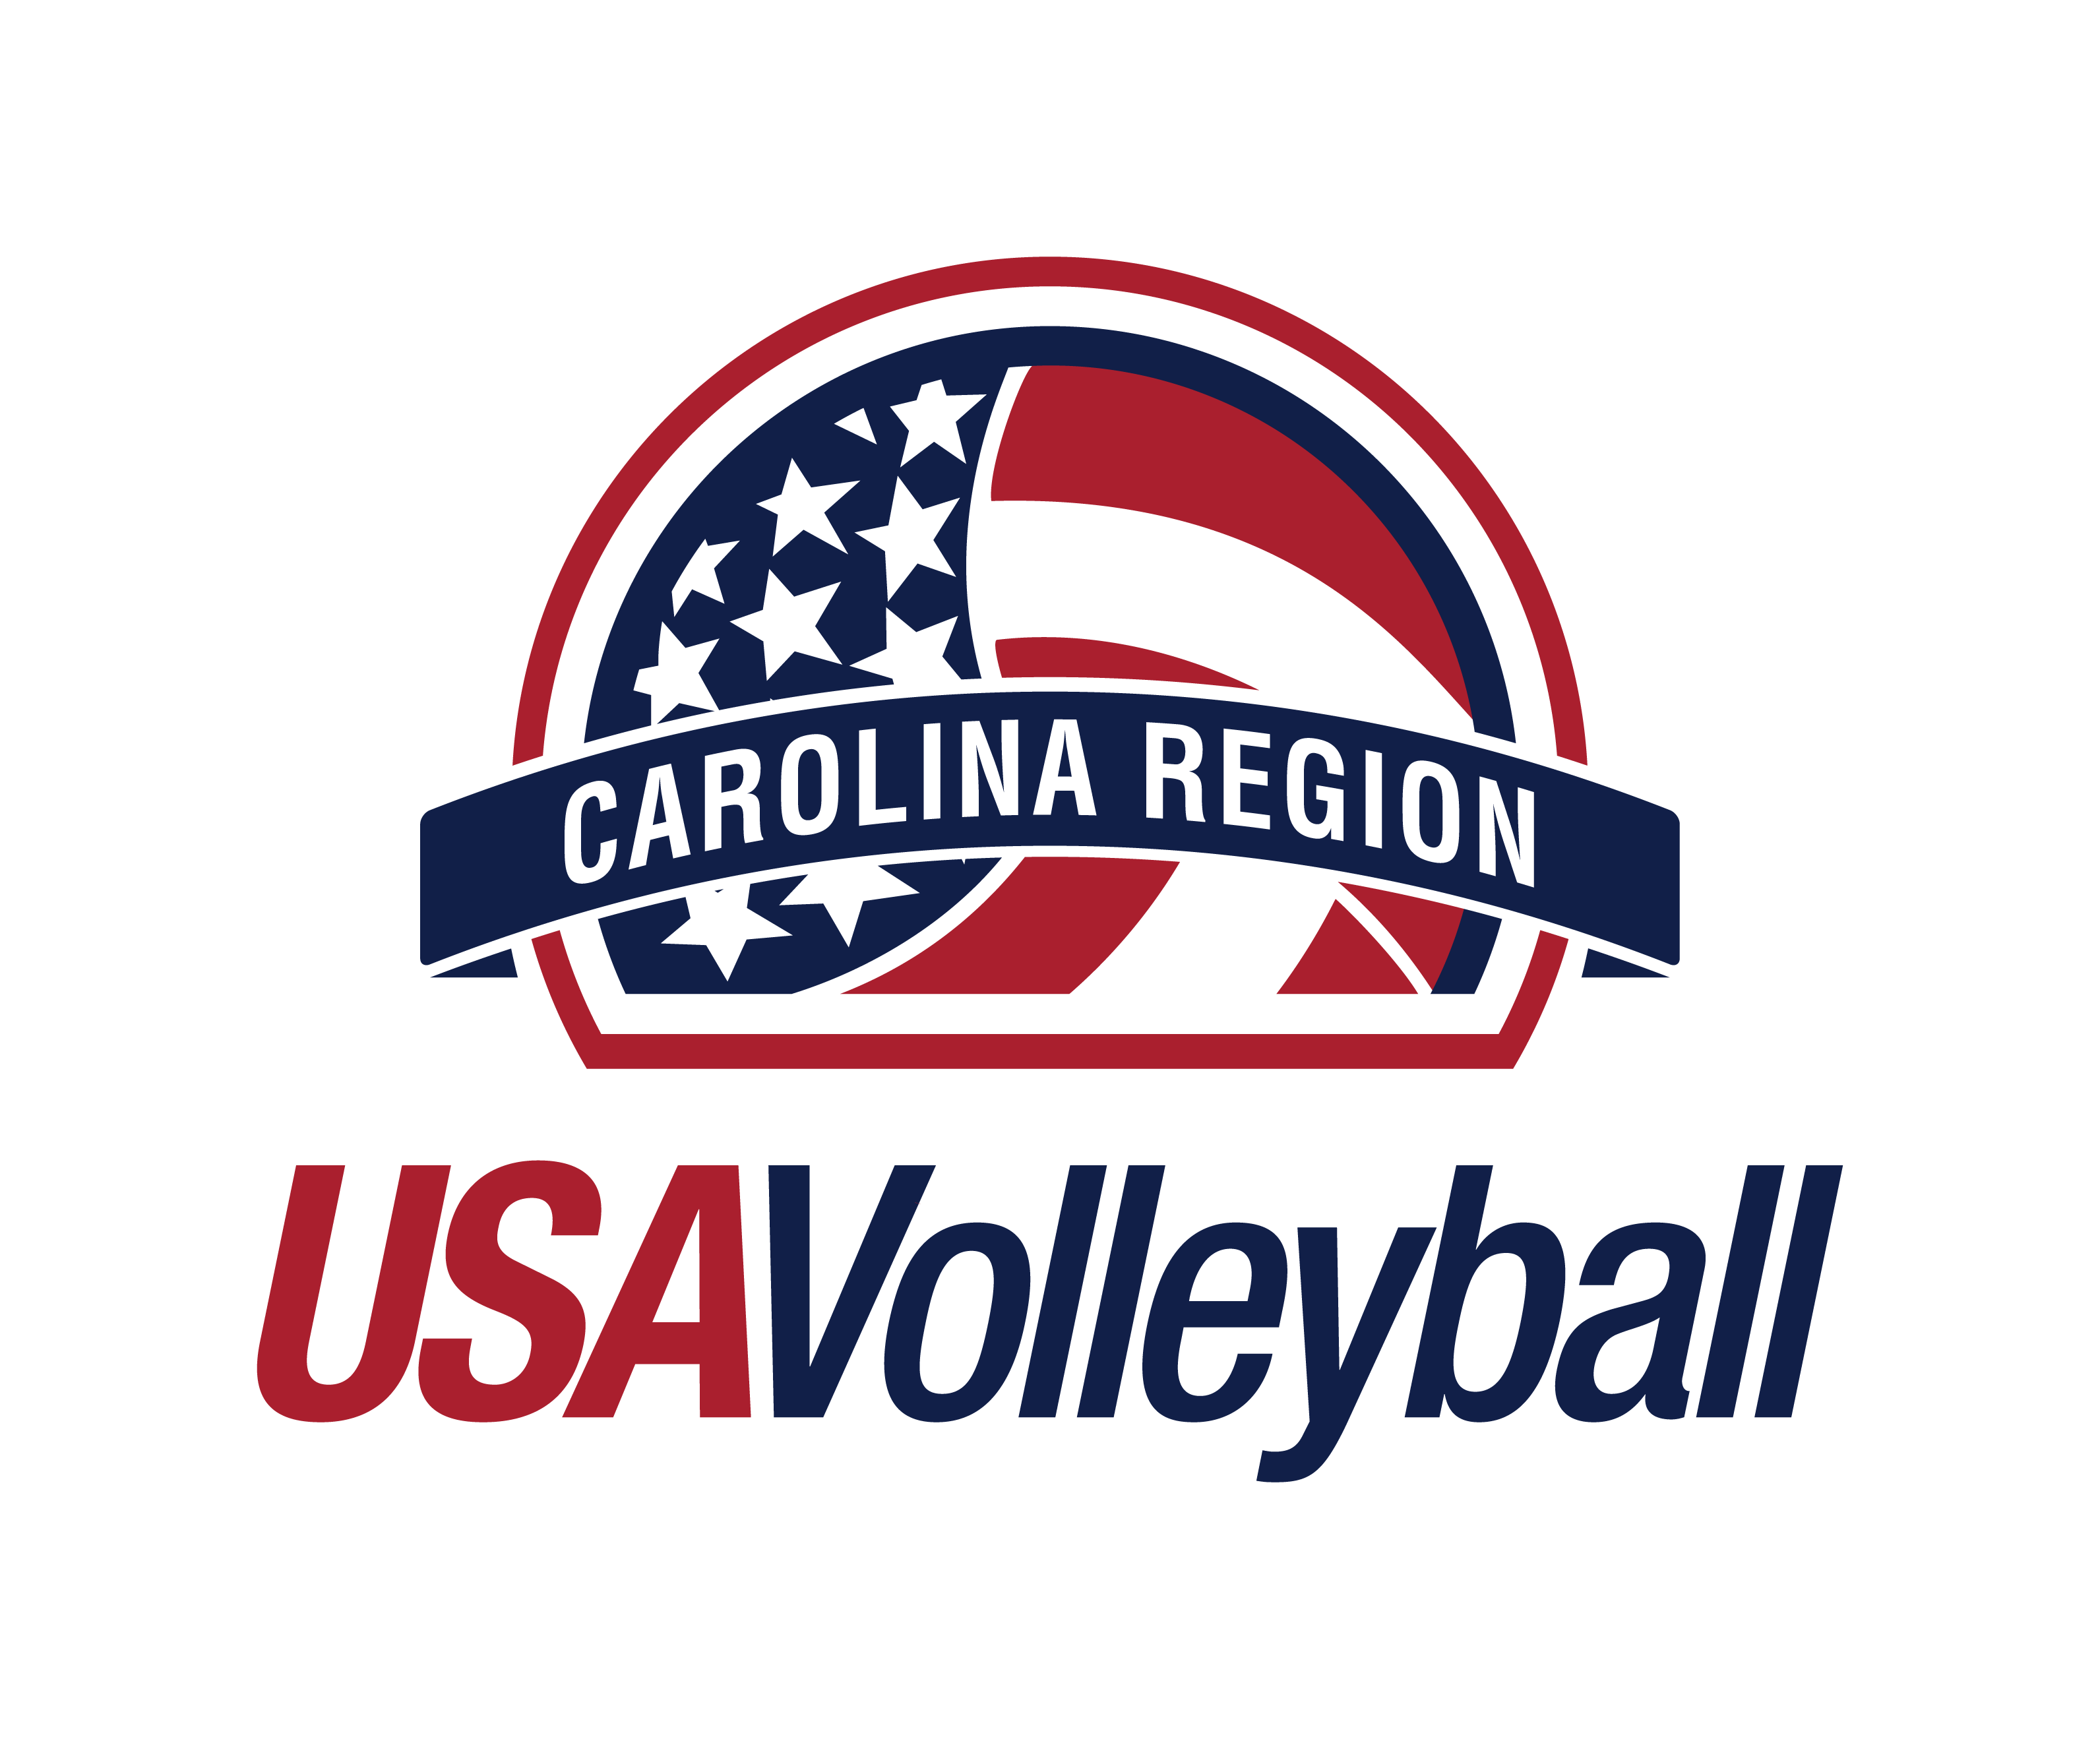 Carolina Region logo